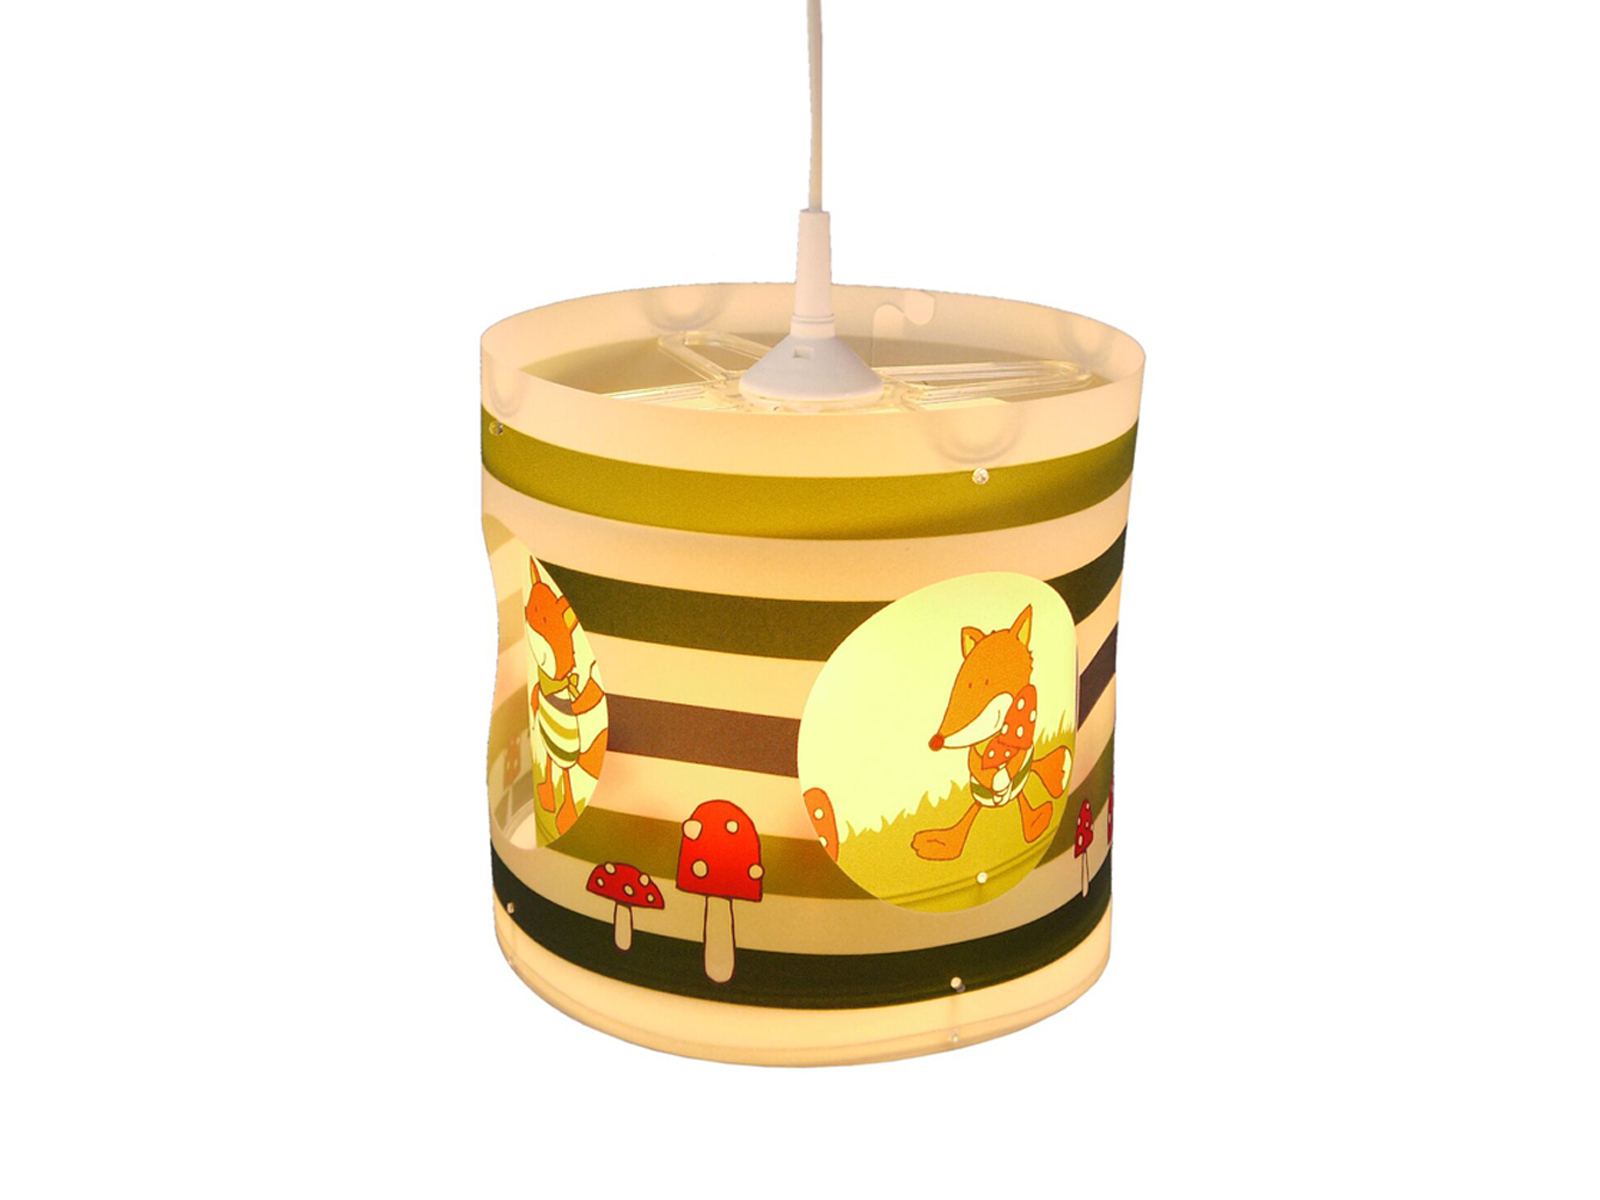 Design LED Kinderzimmerlampe FOX Lampenschirm drehend LED Licht  Kinderzimmer NEU